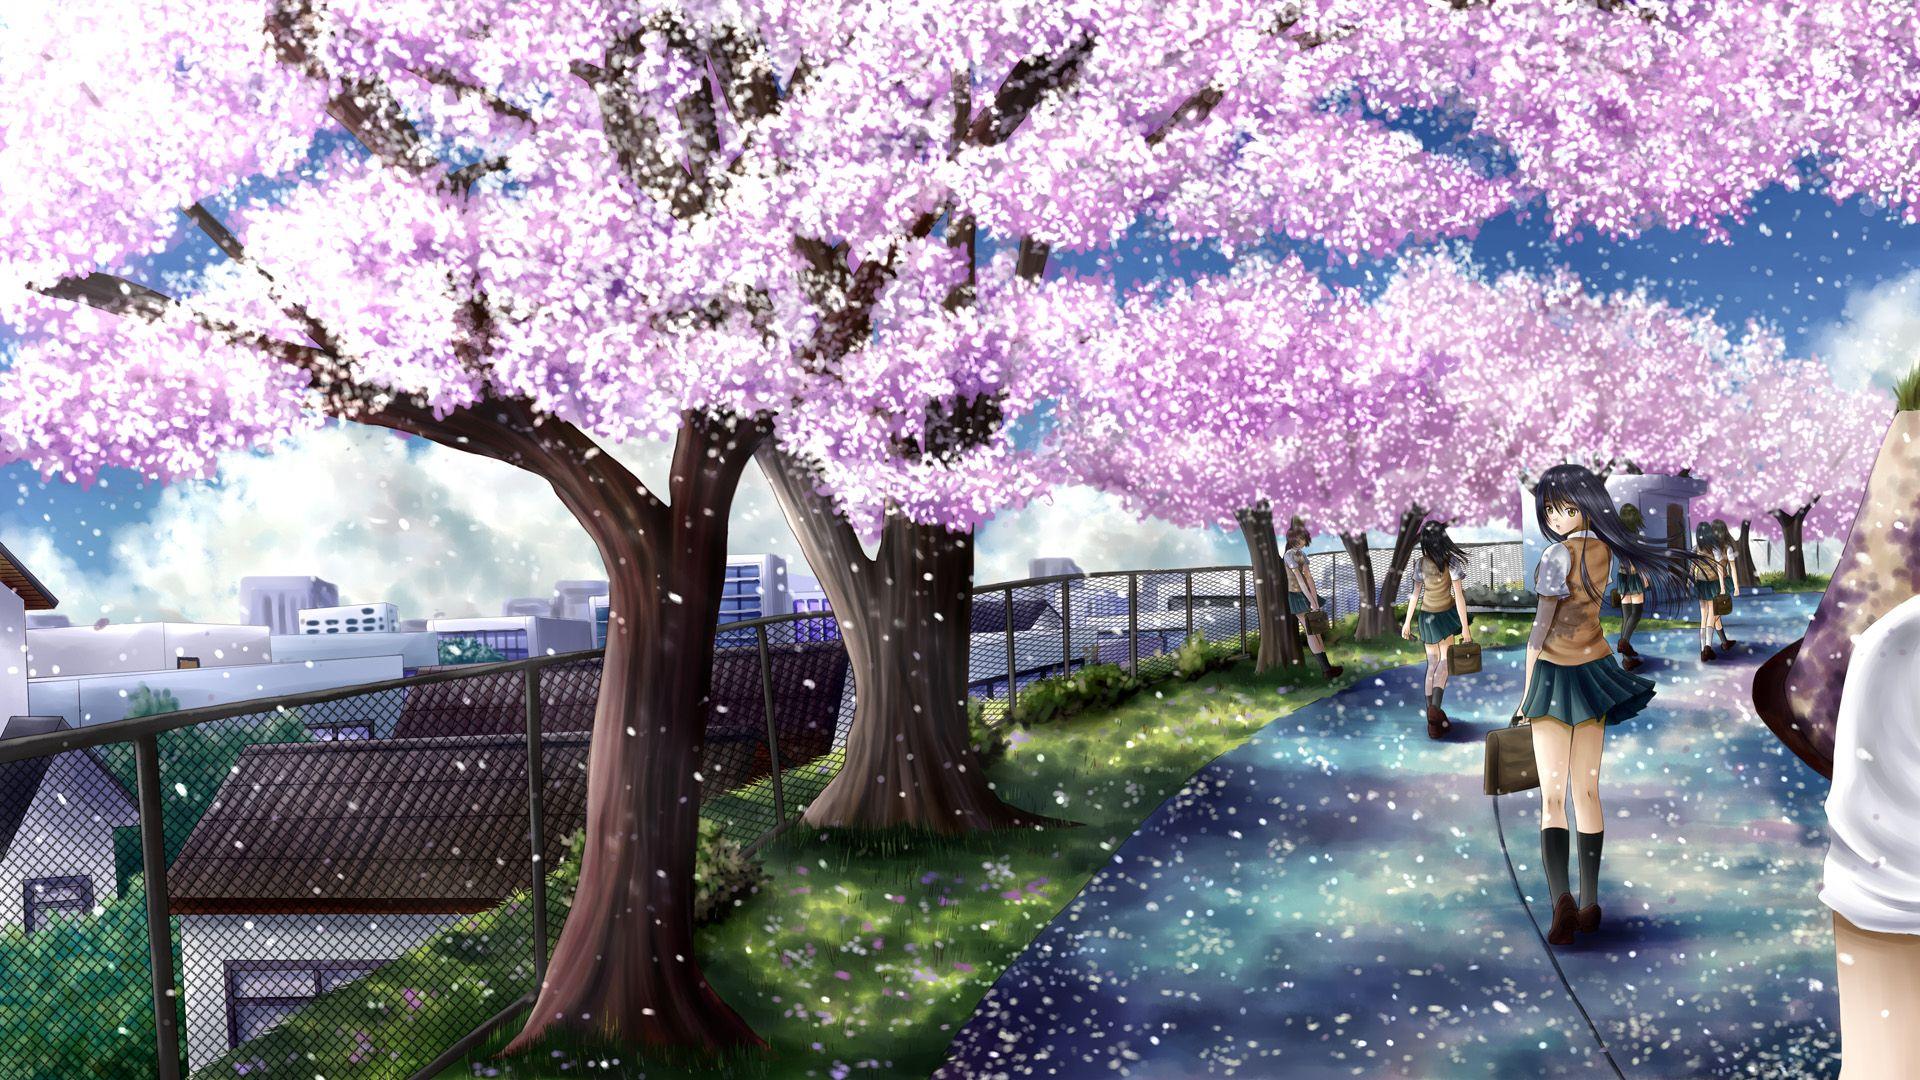 Aesthetic Cherry Blossom Anime Background